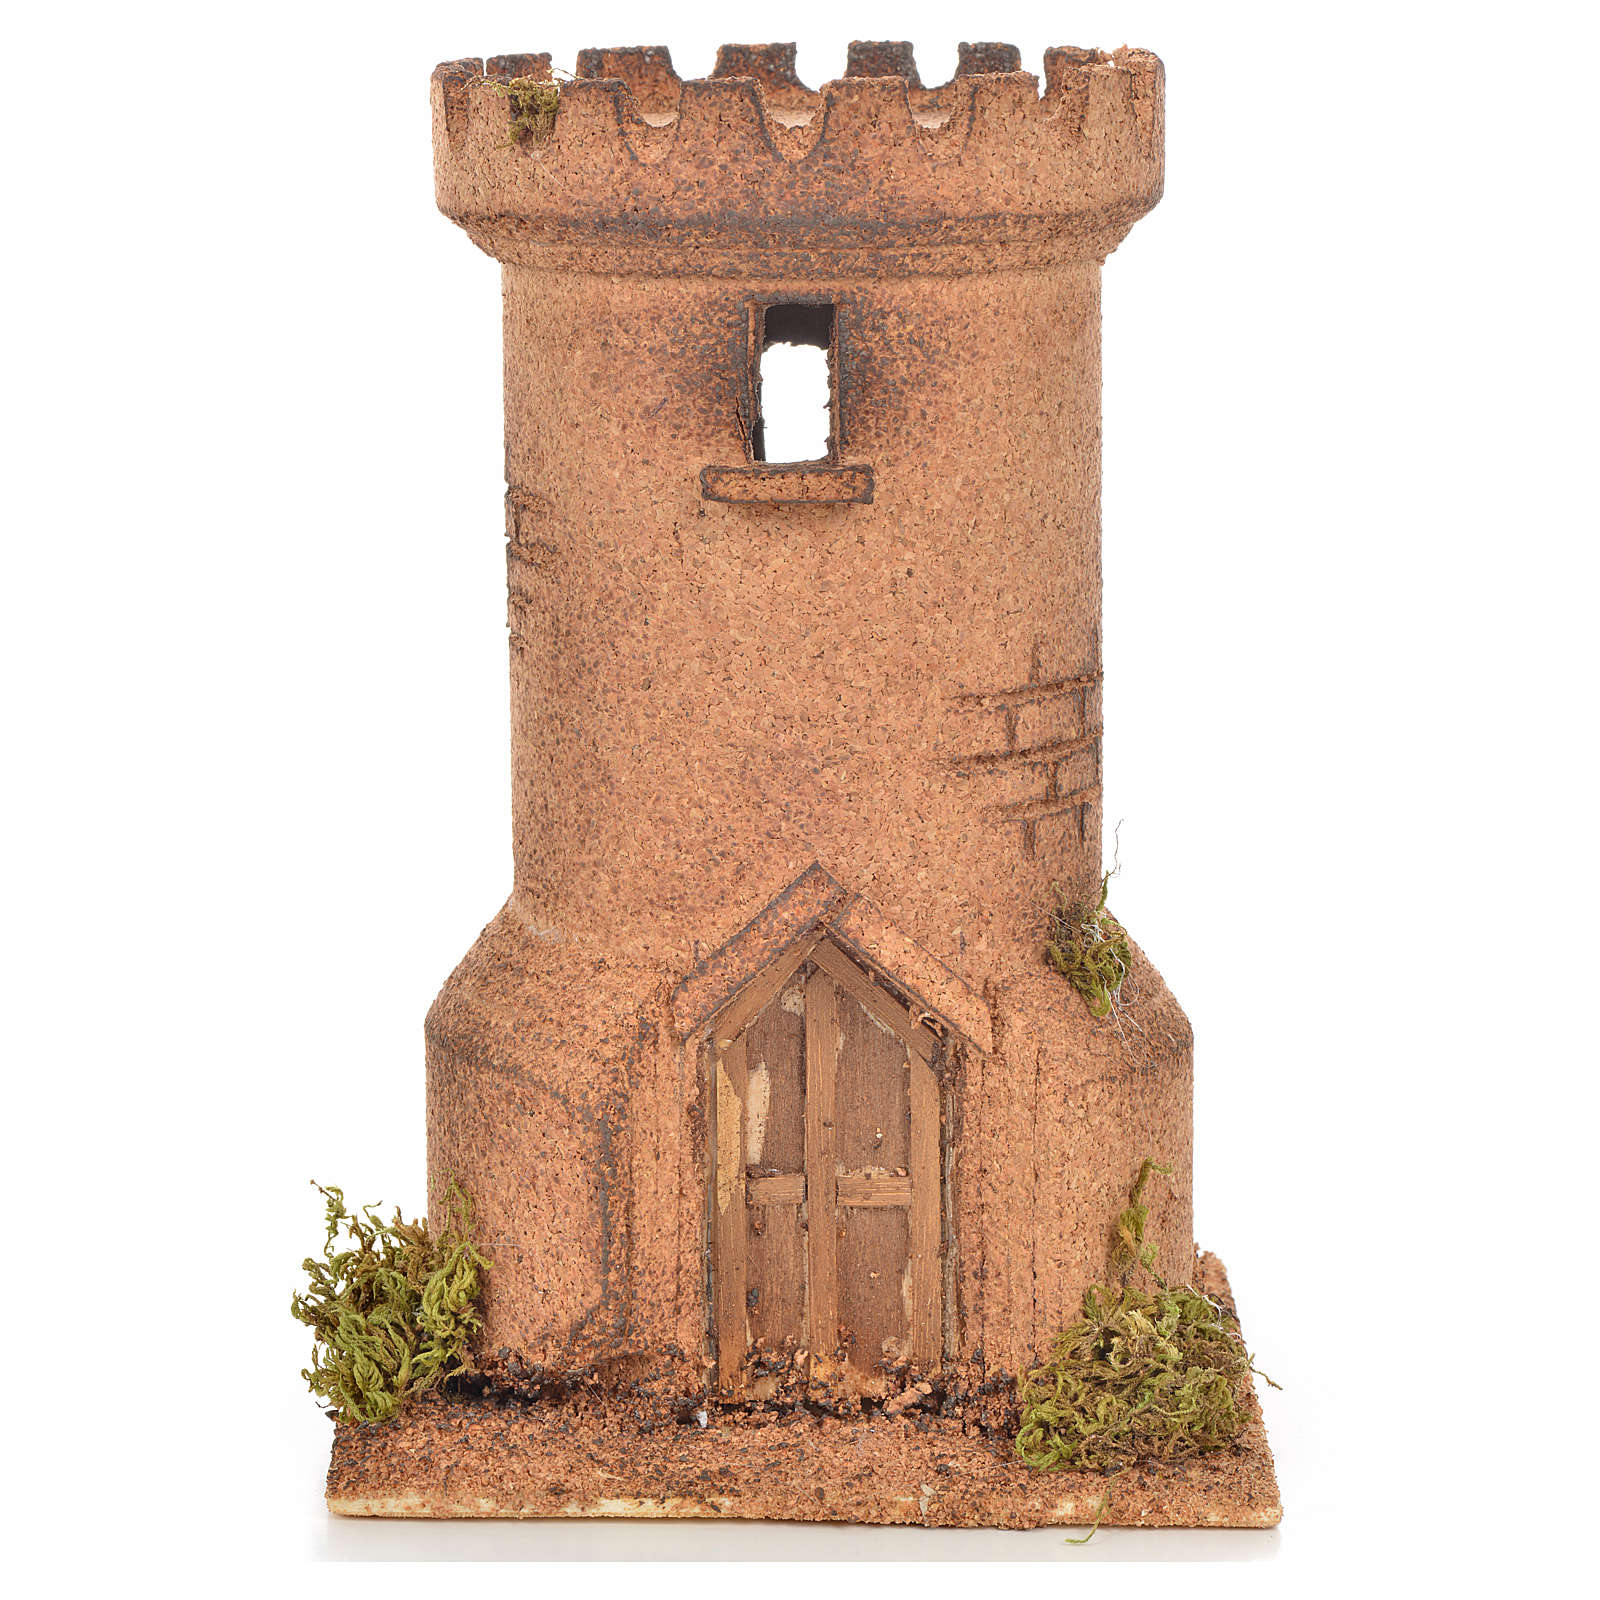 Neapolitan Nativity scene accessory, cork tower 13x13x20,5 cm 4